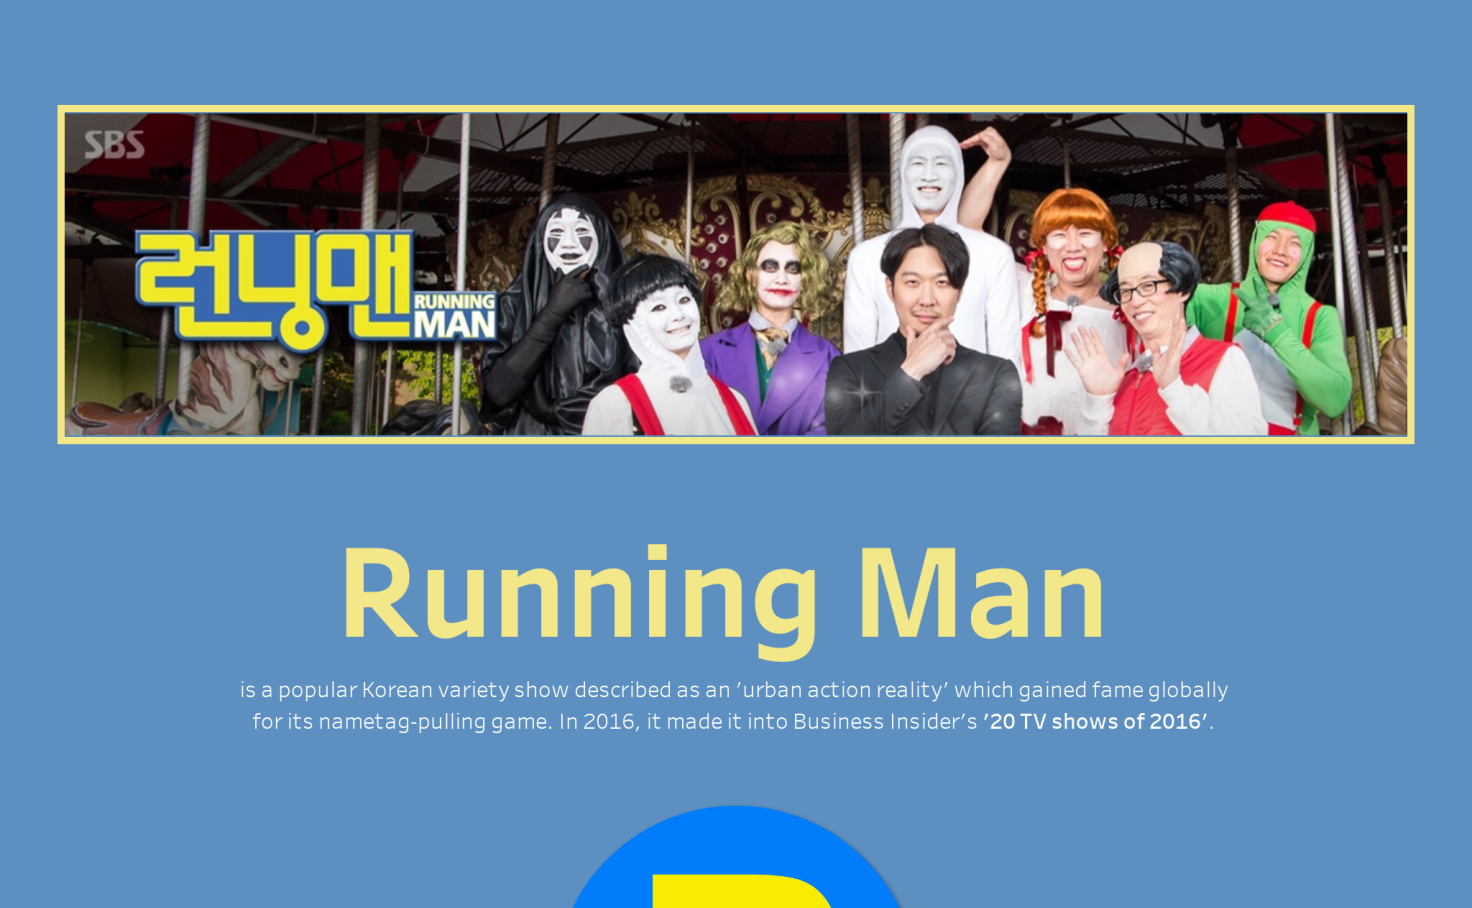 Running Man Korea Royce Ho Tableau Public